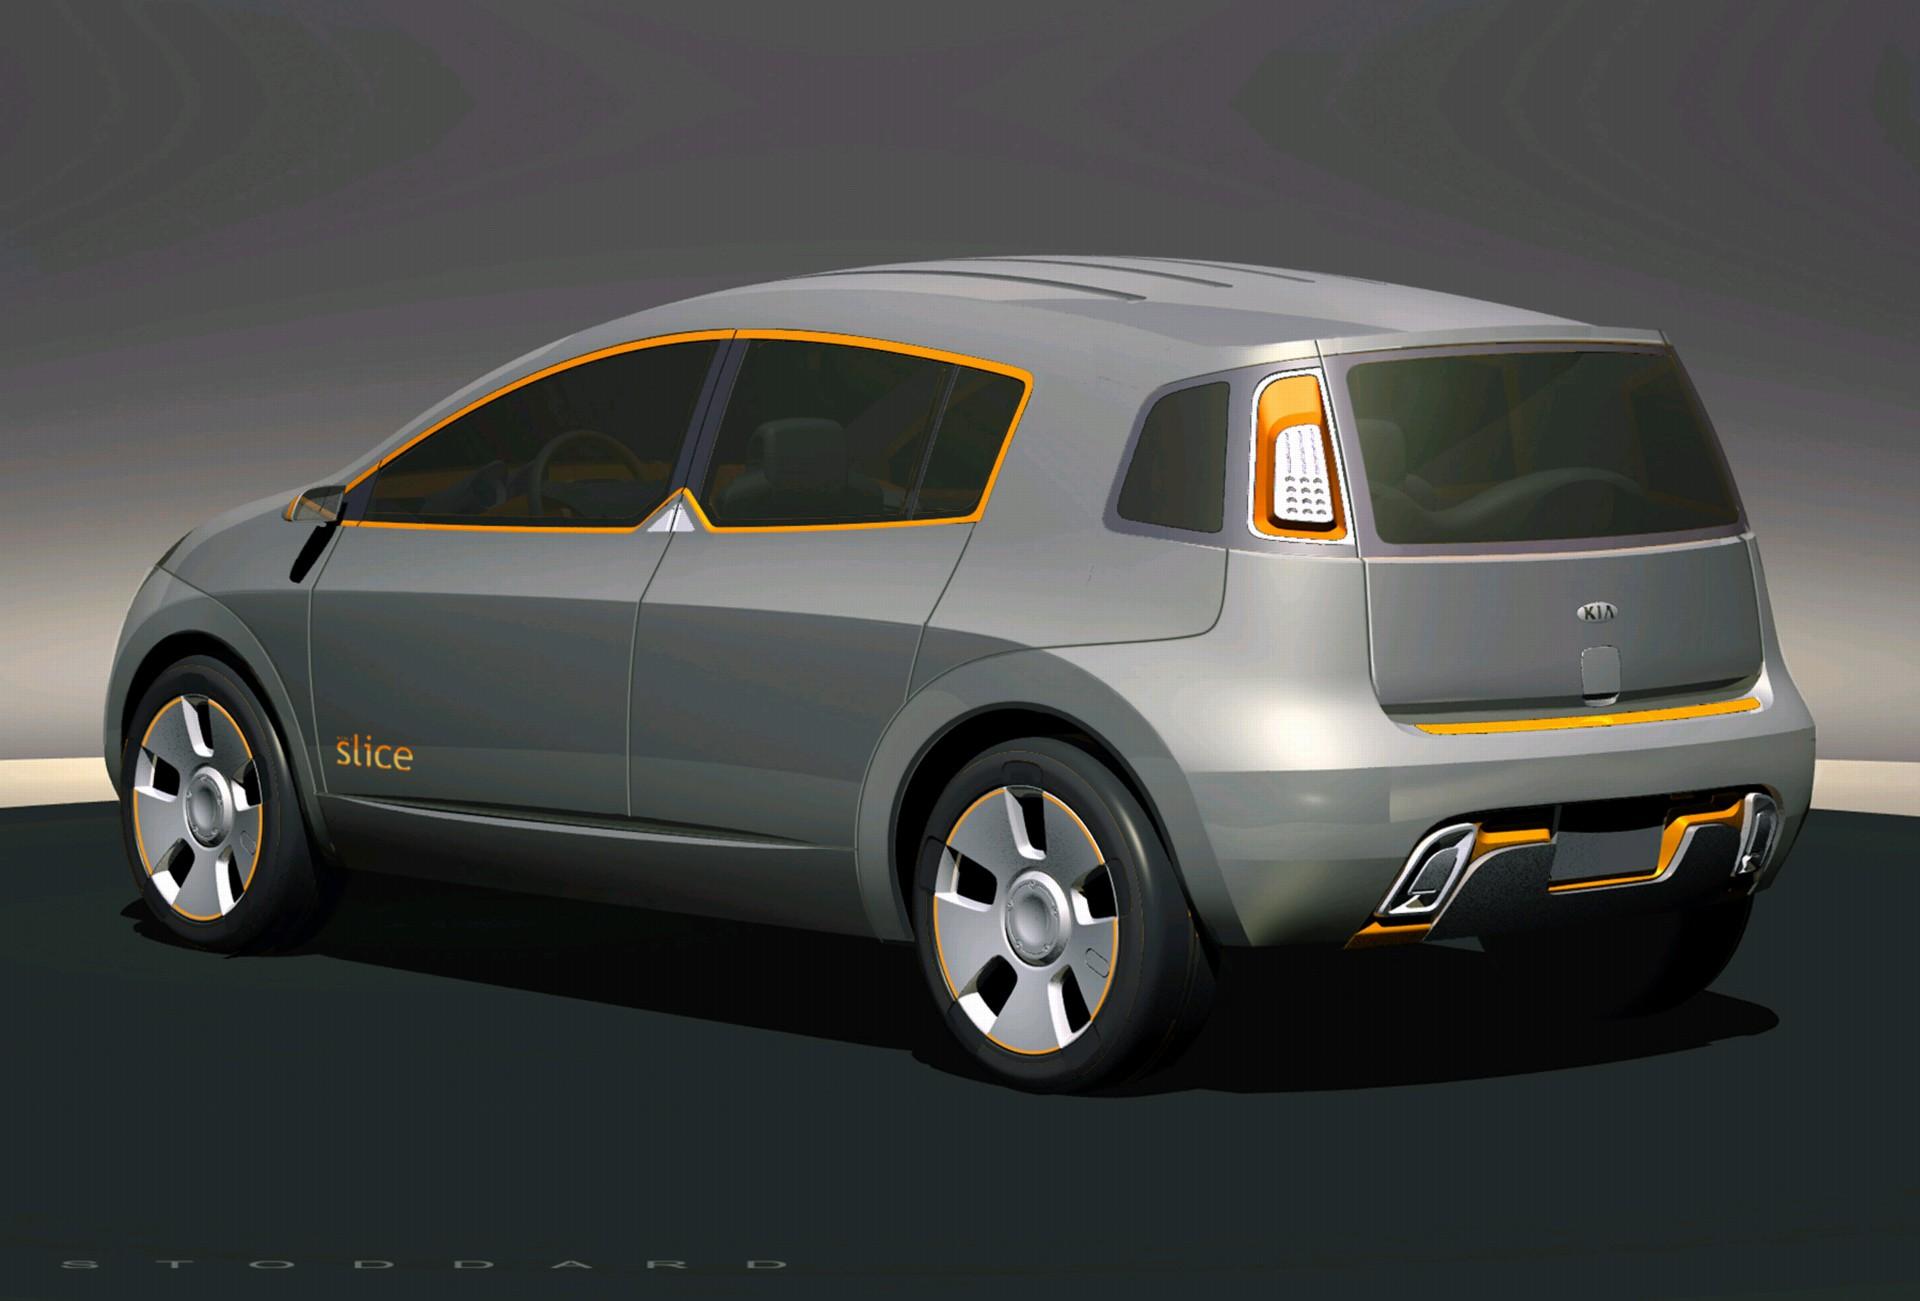 2003 Kia KCD-I Slice Concept